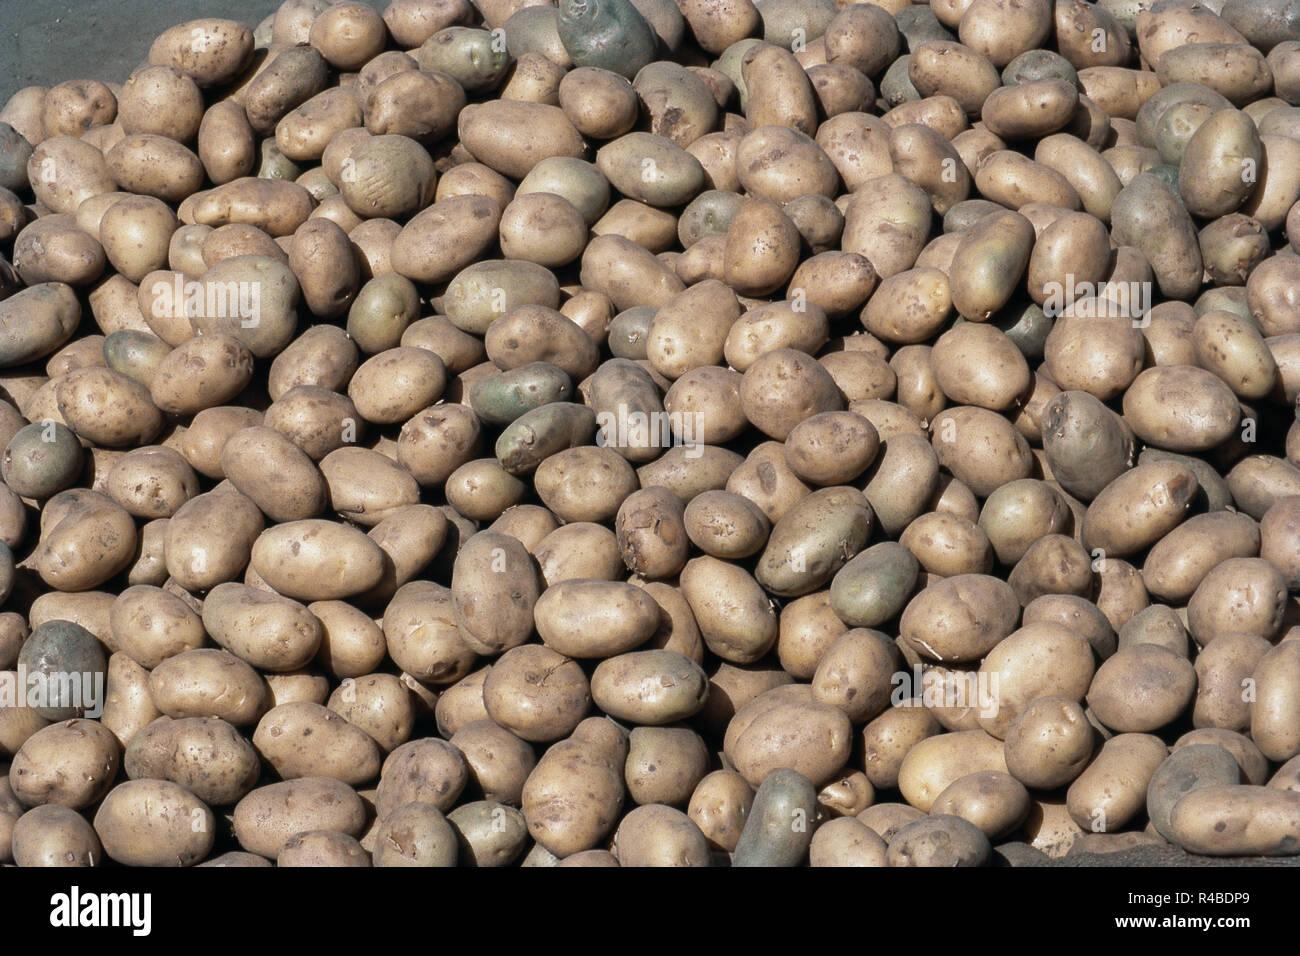 Close up view of potatoes at Manali, Himachal Pradesh, India, Asia - Stock Image